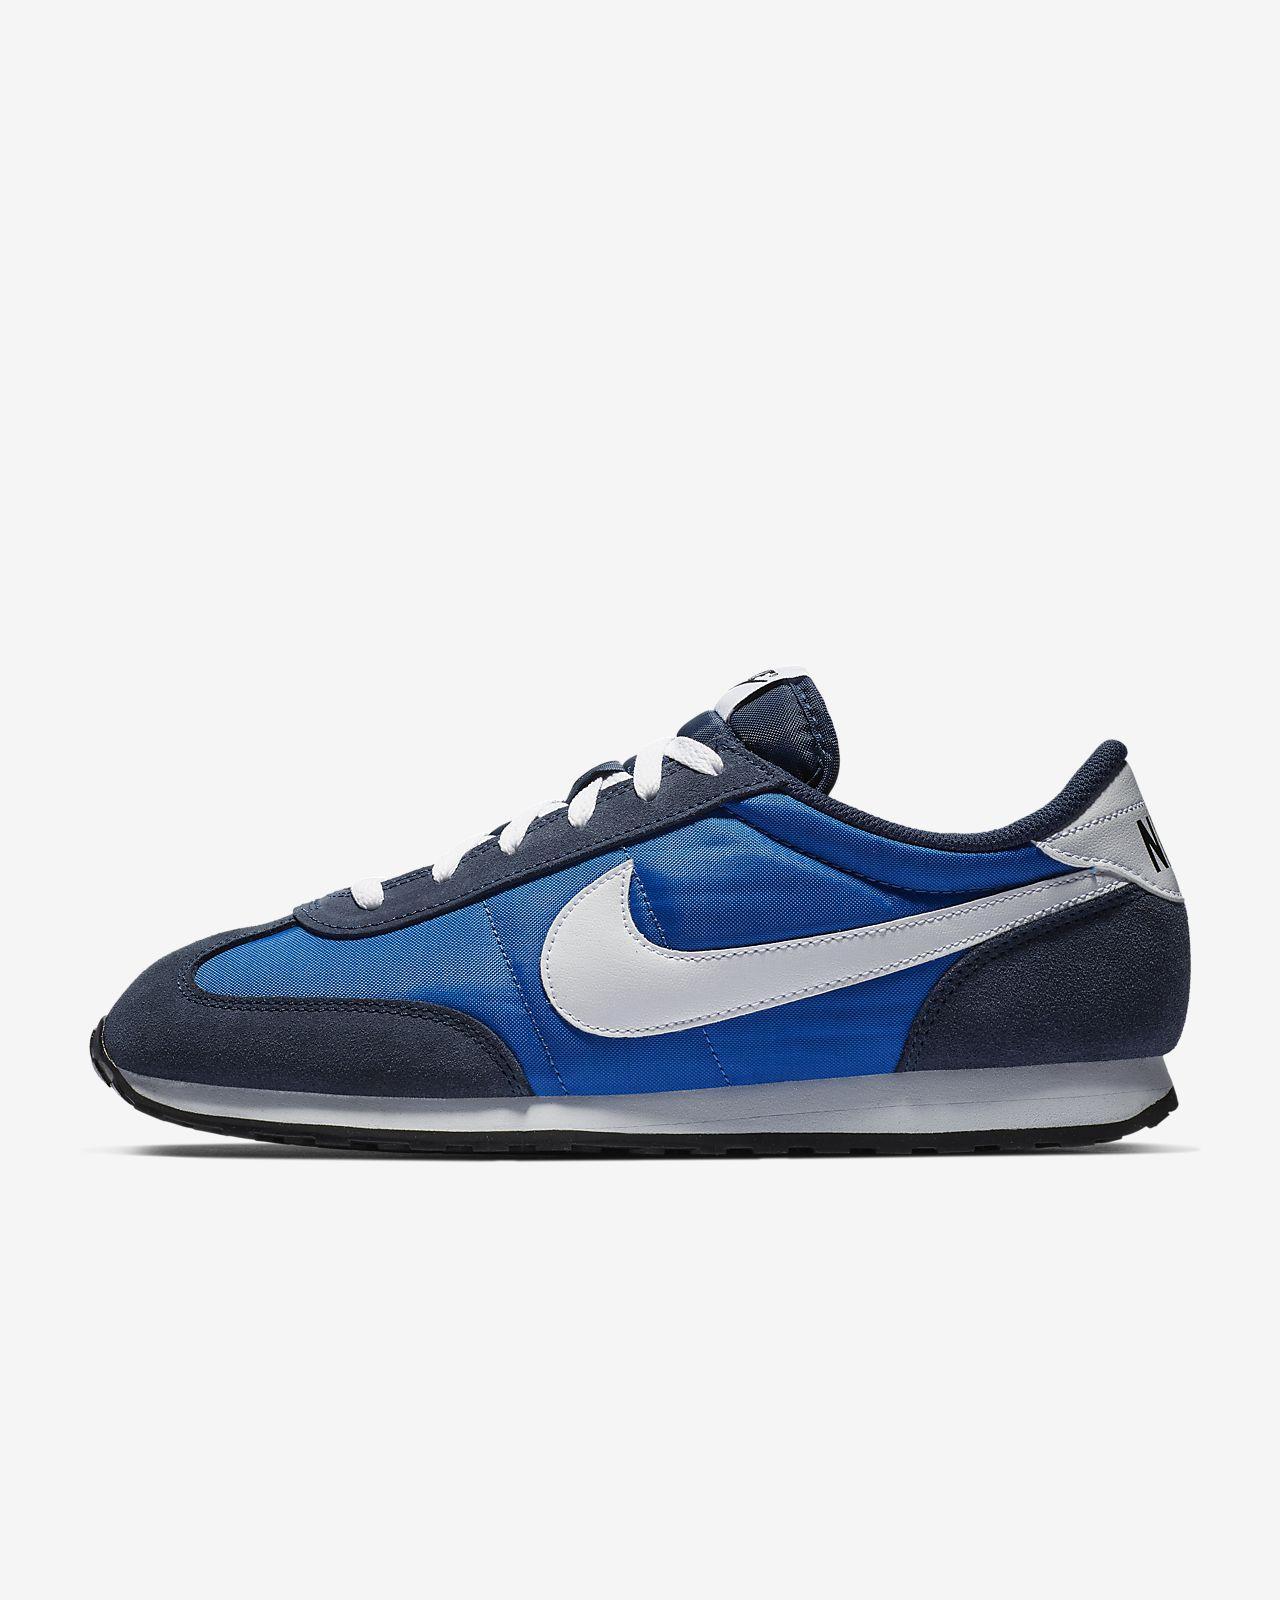 6a398c157de5e Nike Mach Runner Men s Shoe. Nike.com DK